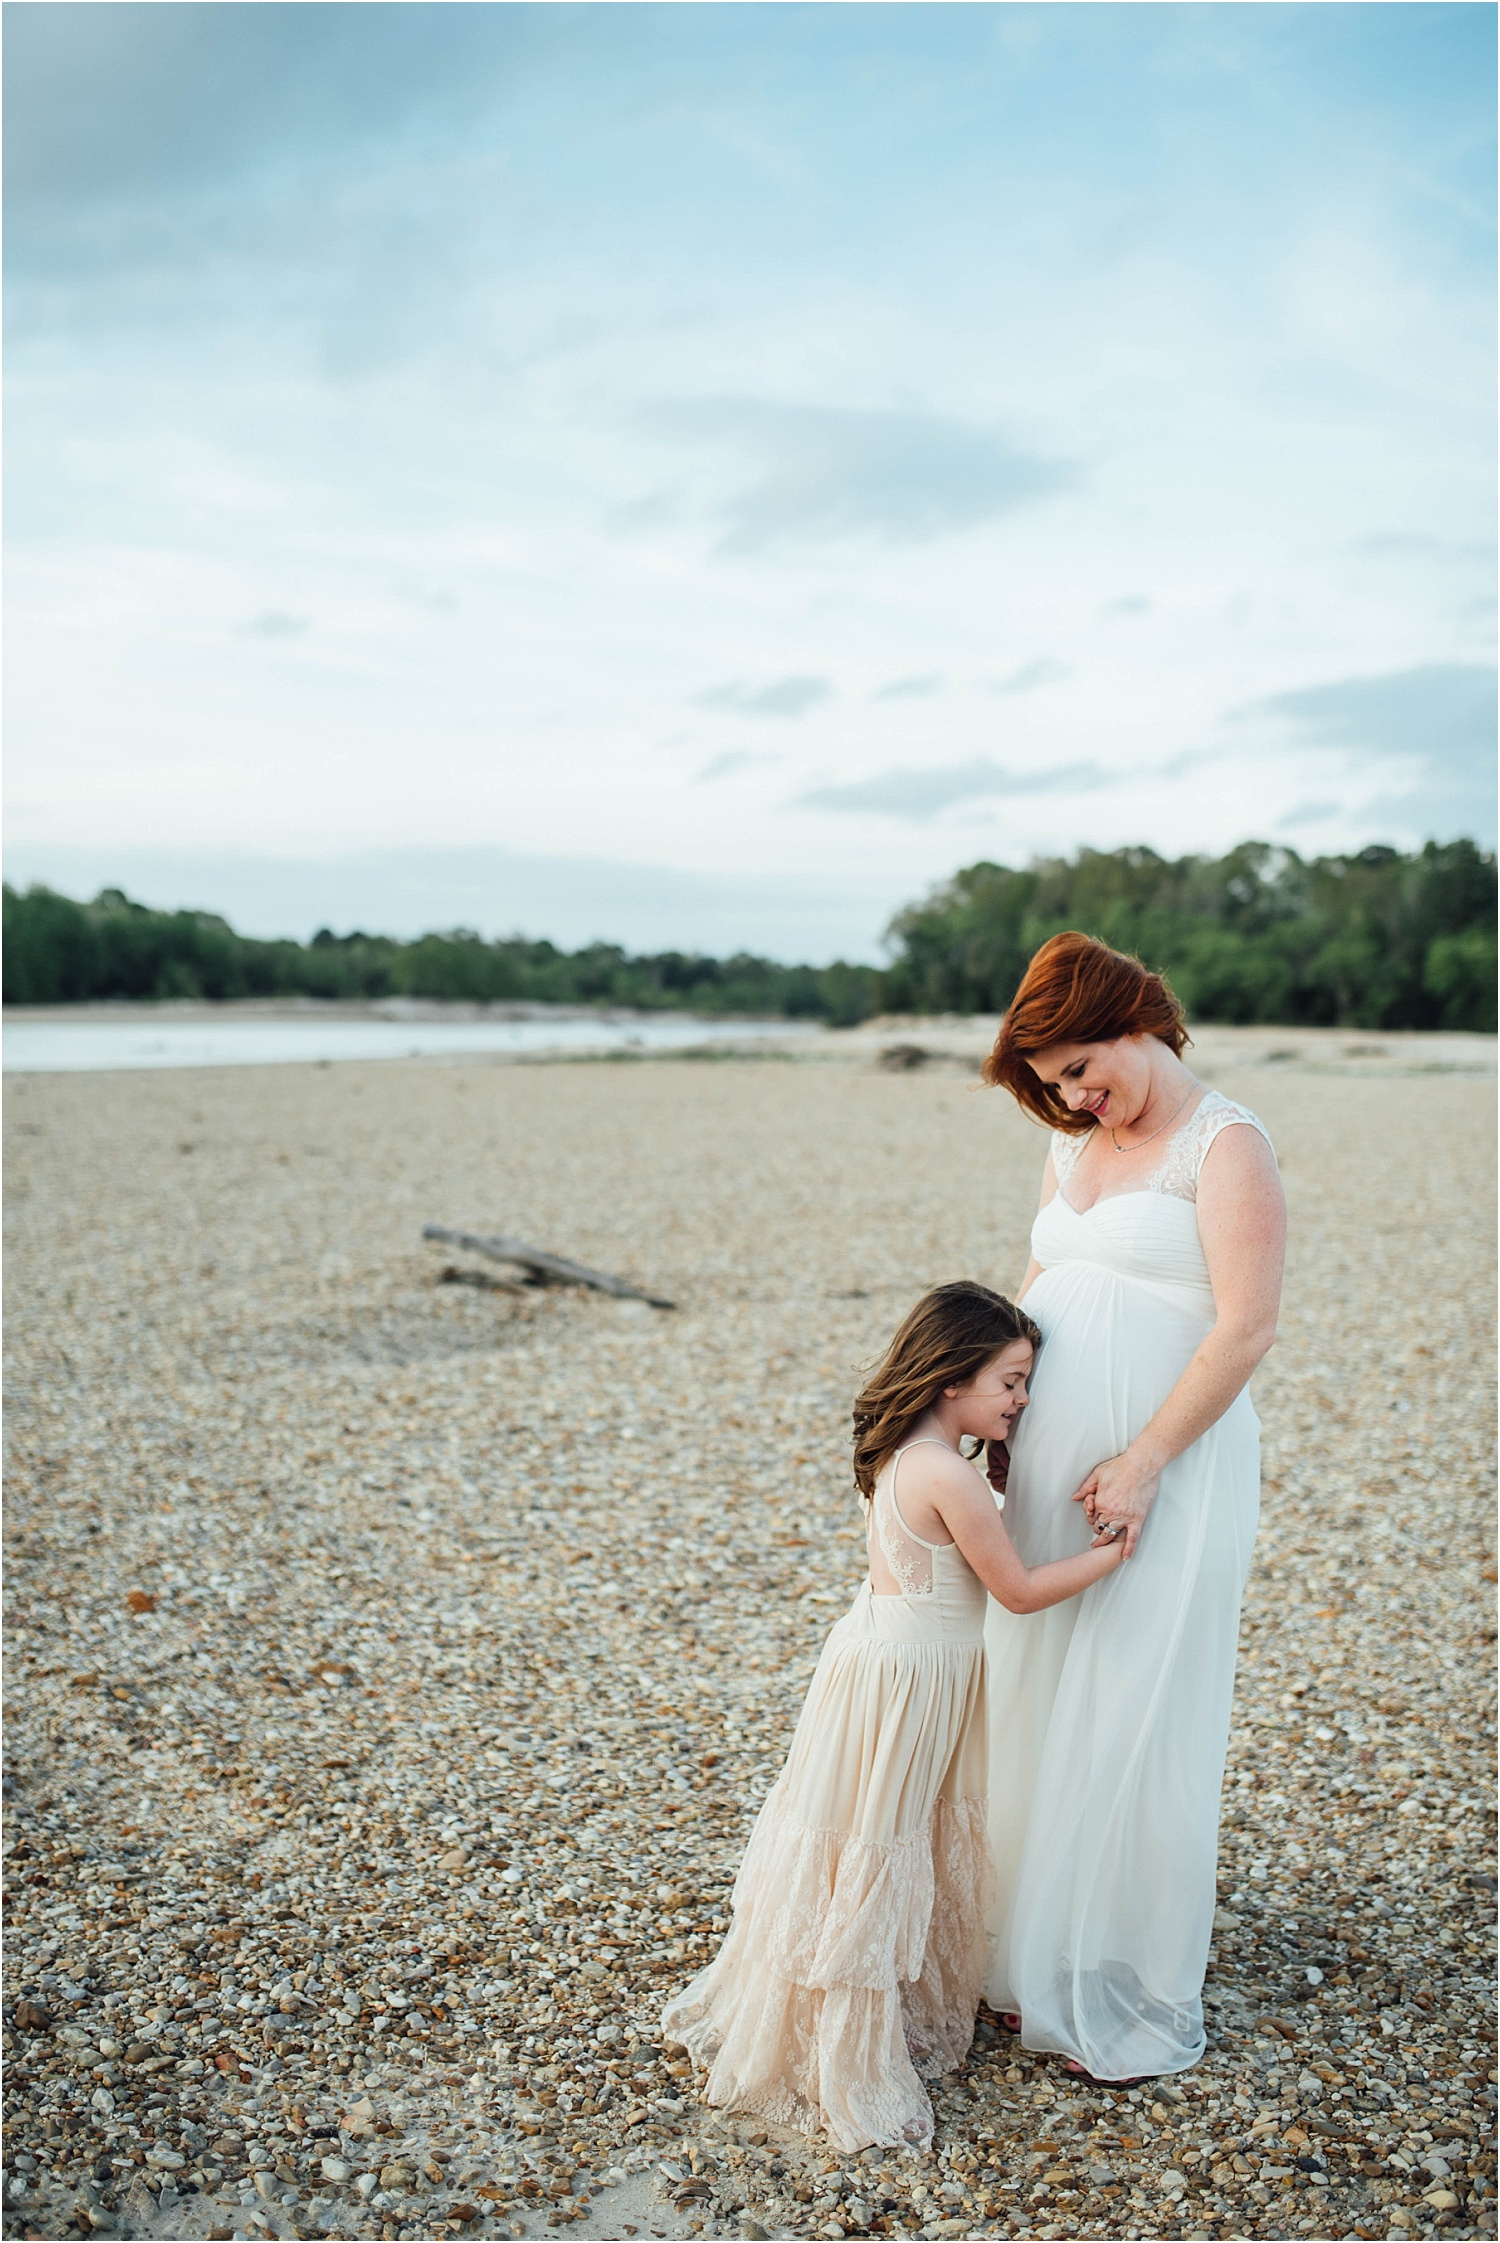 Sarah + Charlotte-Mommy-and-Me-Amite-River-Maternity-Photos_Gabby Chapin_Print_0058_BLOG.jpg